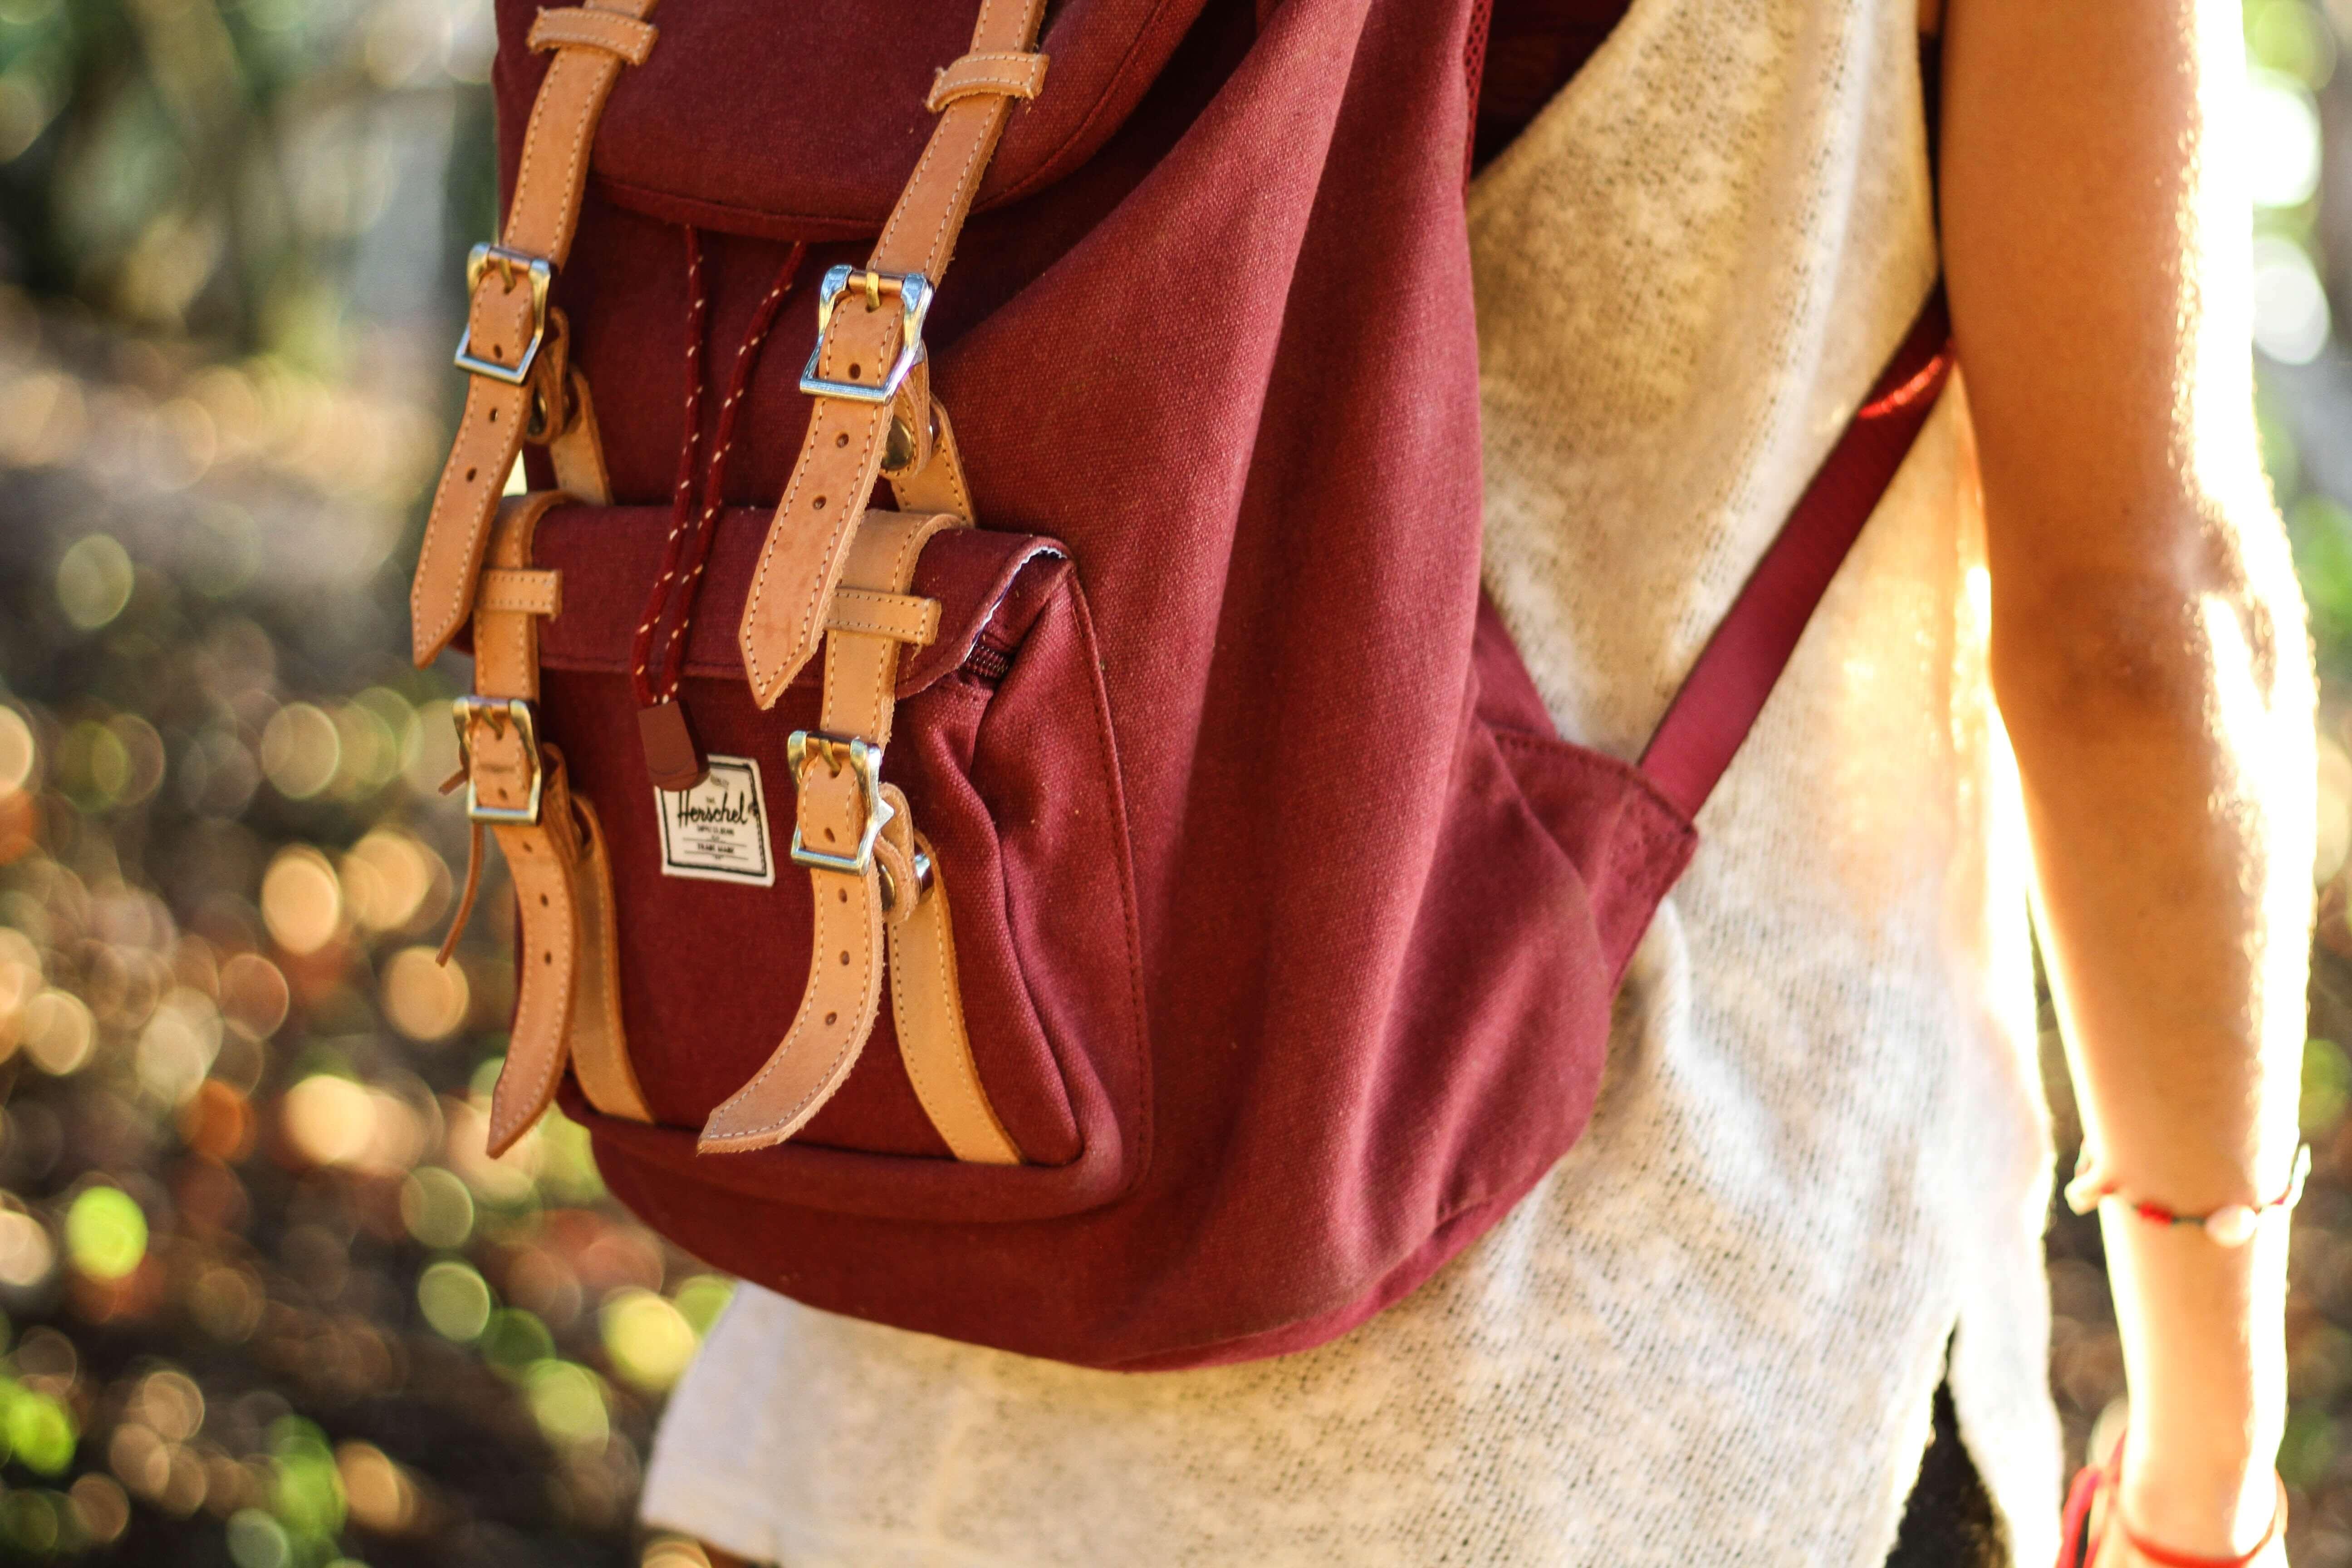 Back to school εν μέσω κορωνοϊού: Τι πρέπει να περιέχει η μαθητική τσάντα